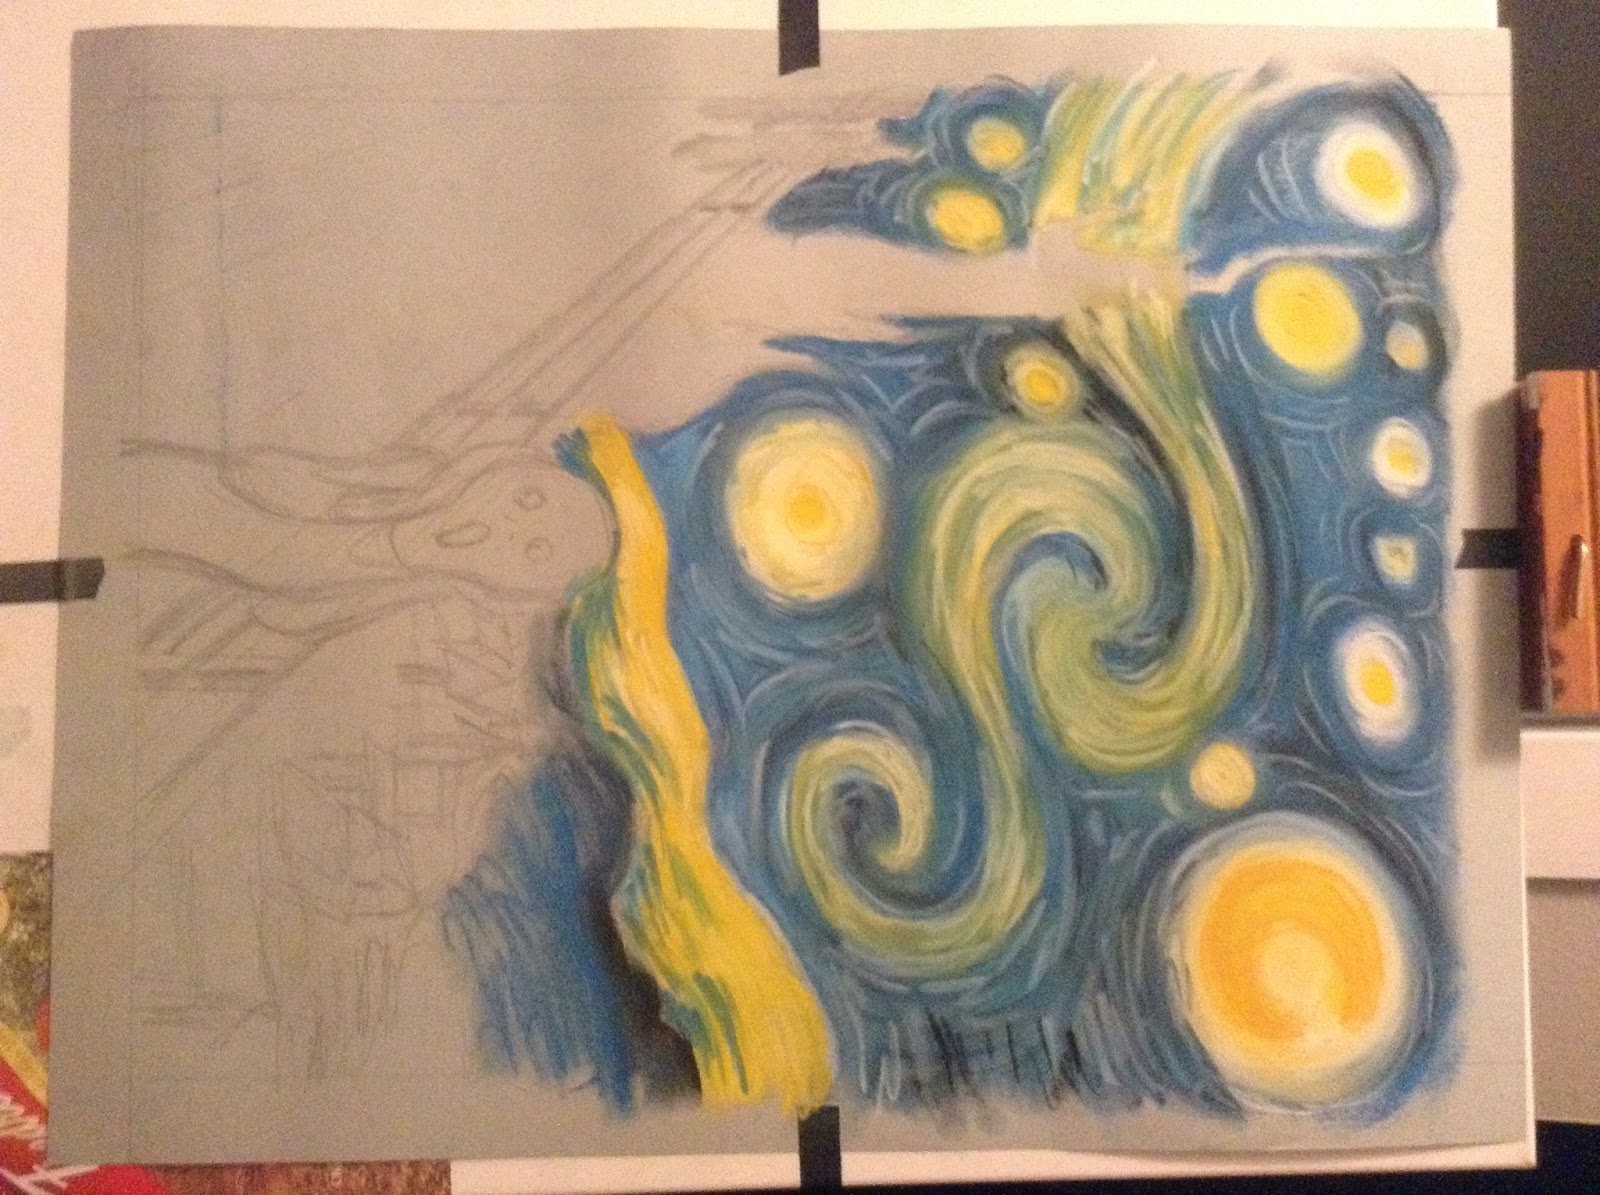 Van Gogh Scream Of course i did feel a little